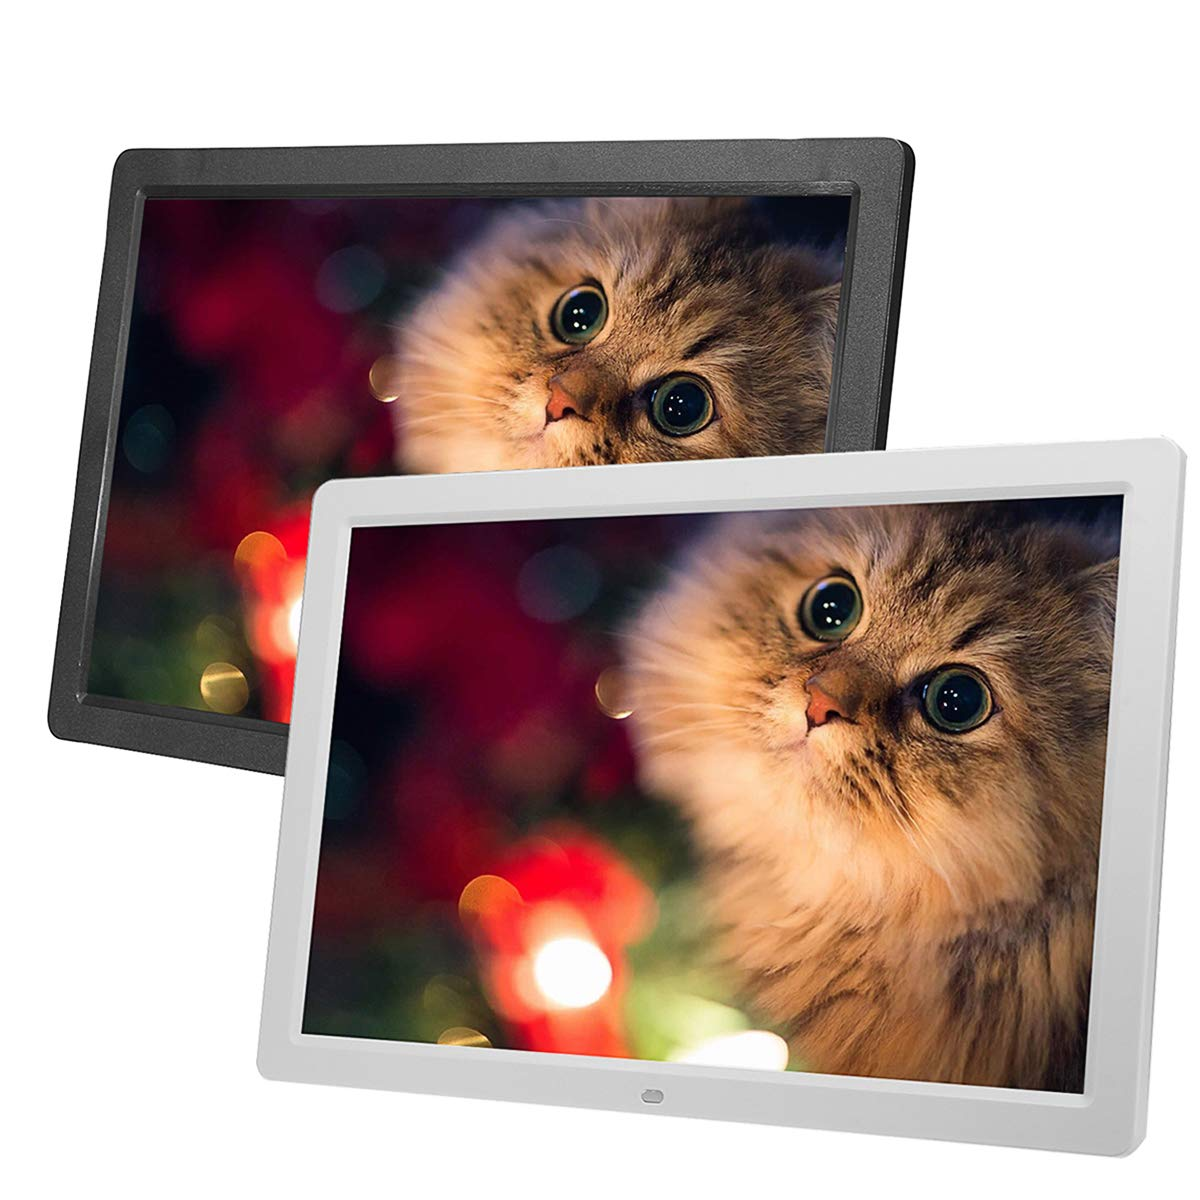 Prament 17インチHD LEDデジタル写真の写真のフレームクロックリモコン付き音楽ムービープレーヤー COD ブラック  ブラック B07MHZCZF5